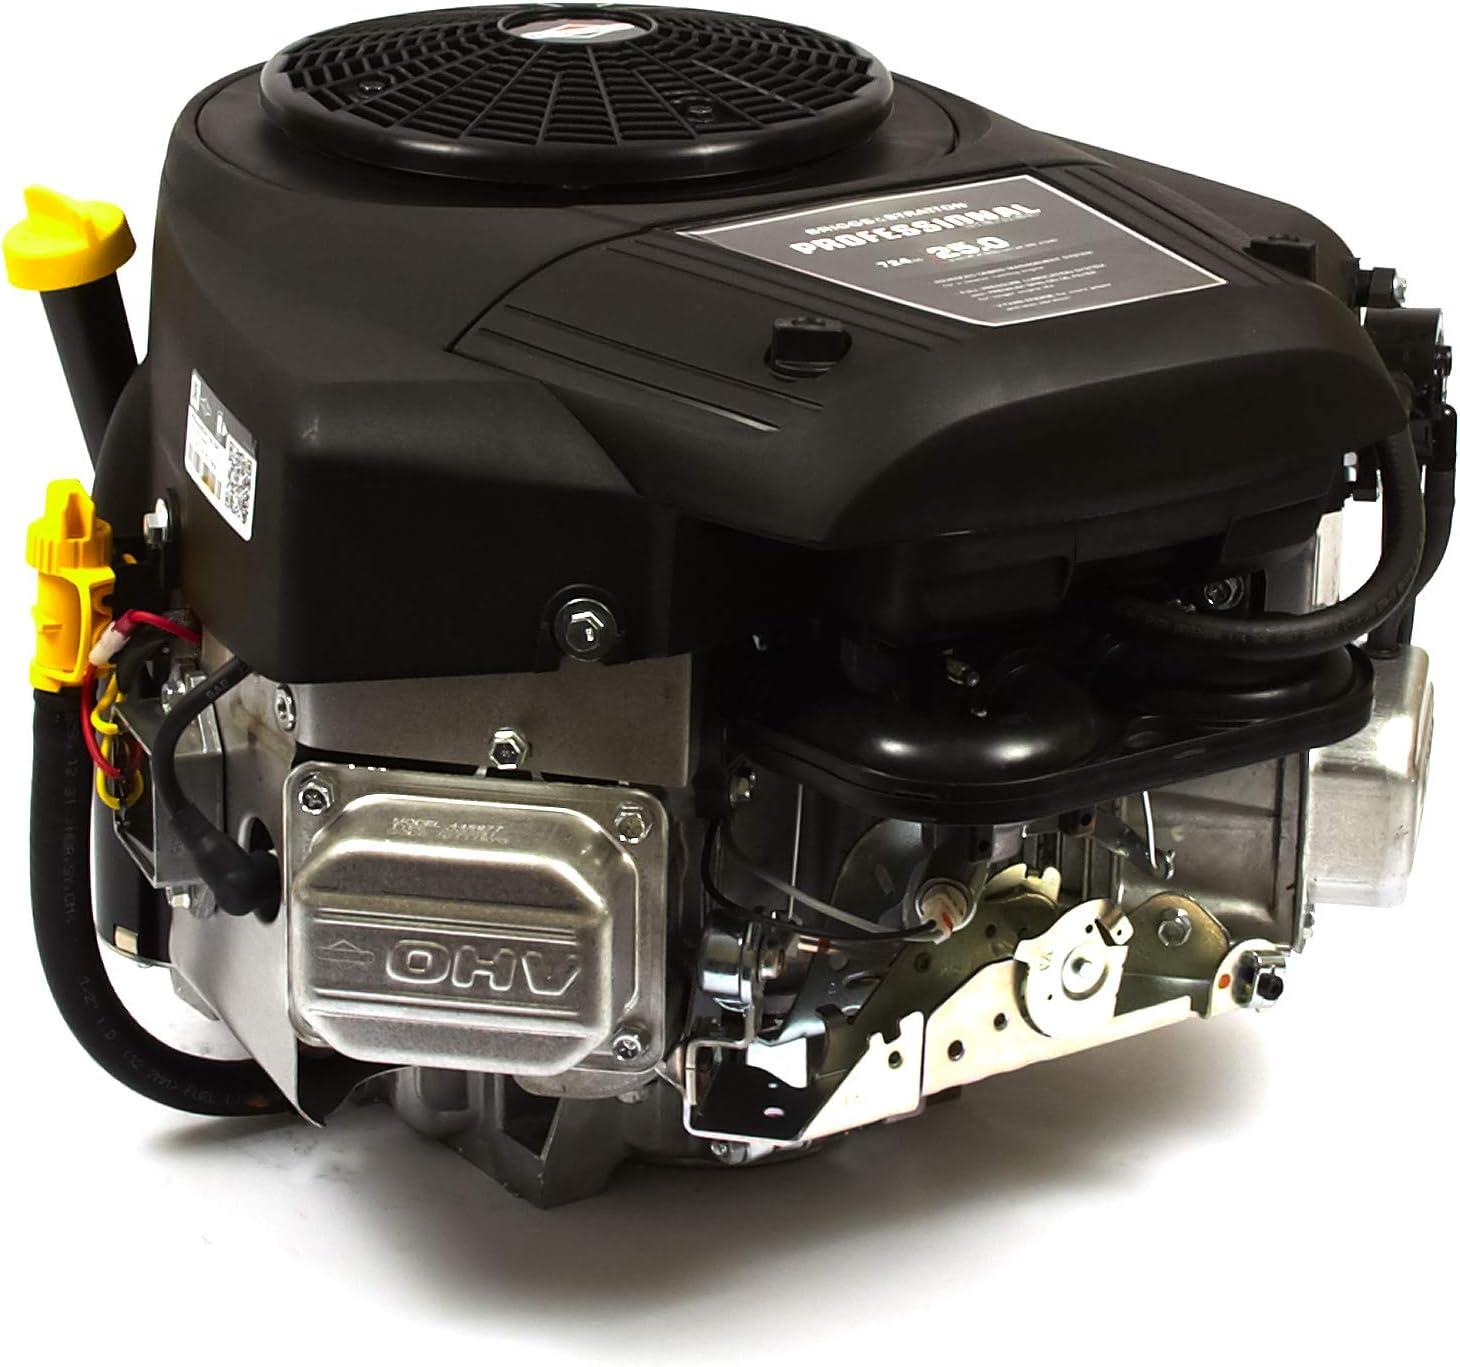 Briggs and Stratton 44S977-0032-G1 25 GHP Vertical Shaft Engine, Black